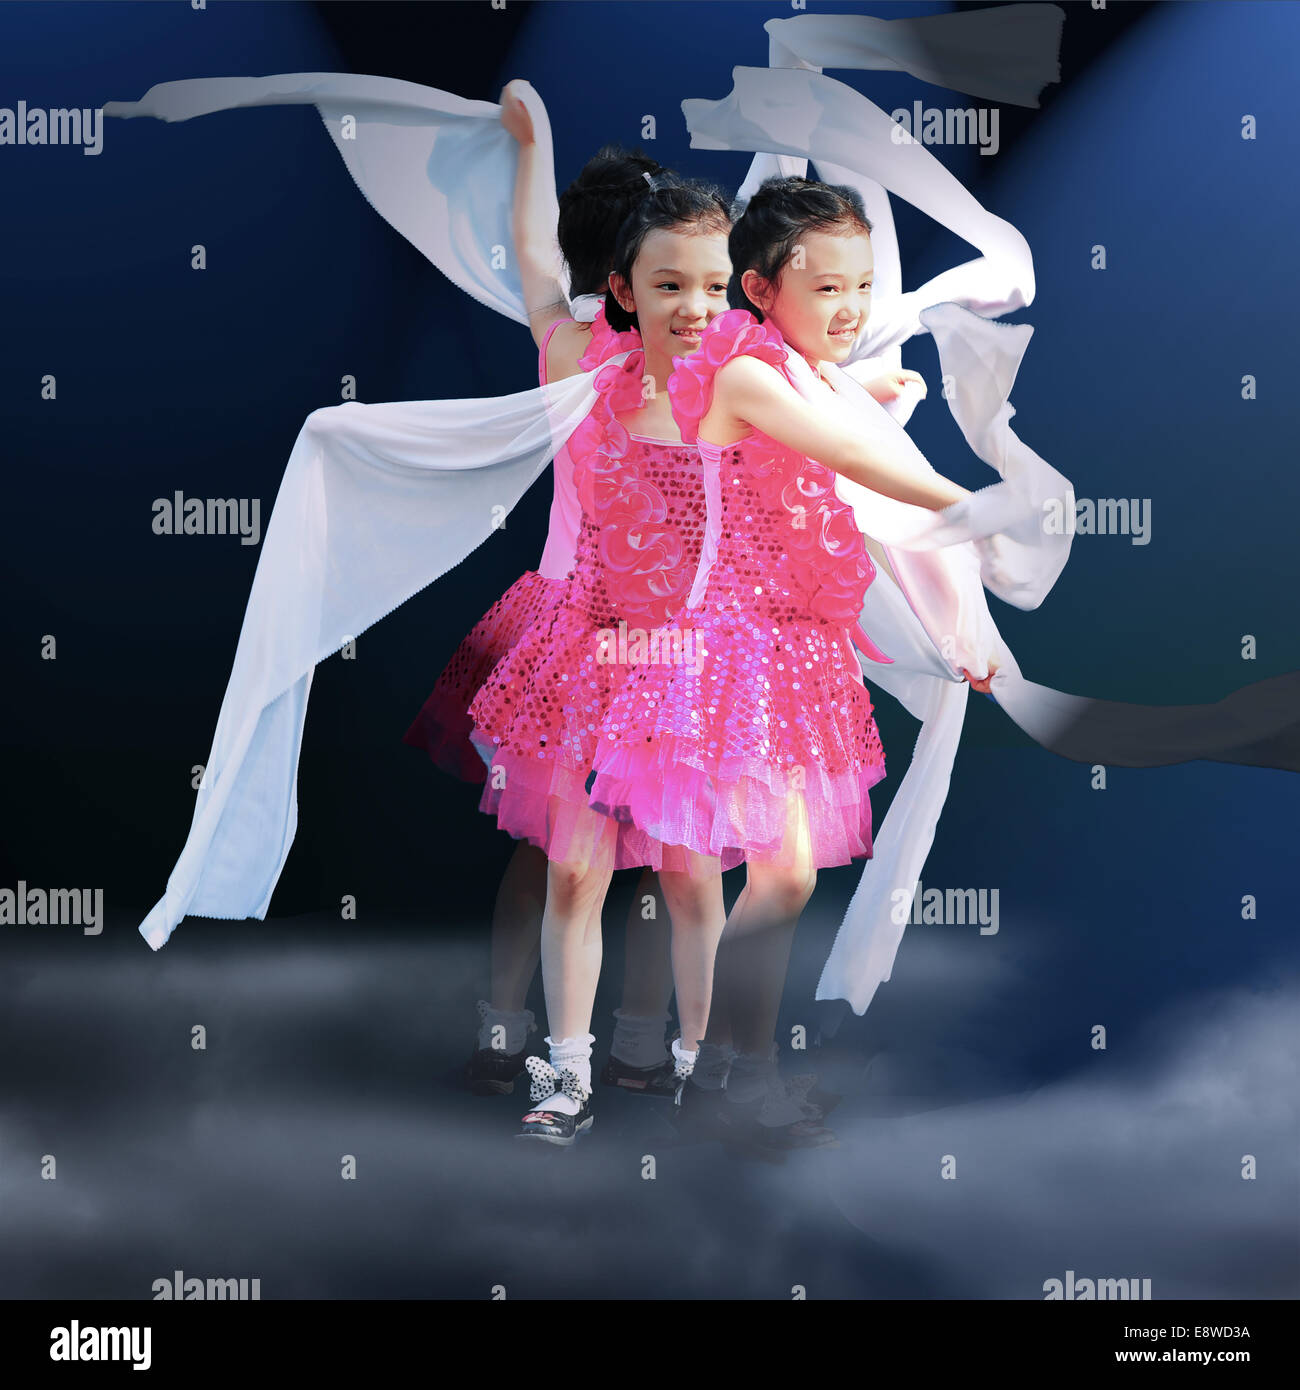 Little Girl Dancing Stock Photos & Little Girl Dancing Stock Images - Alamy